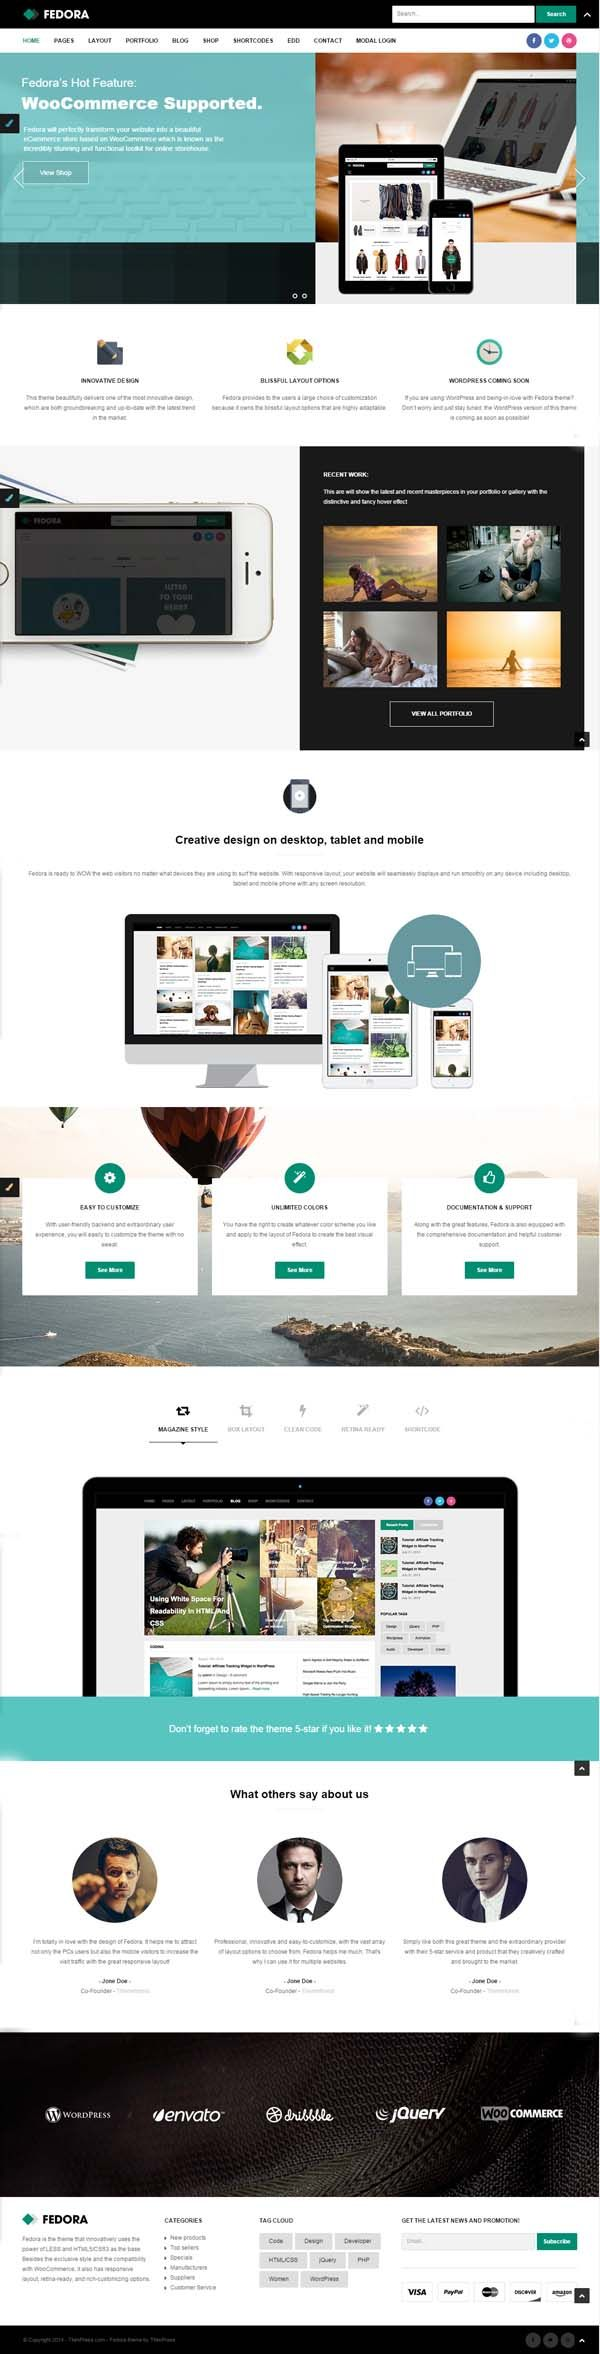 53 best Flat Design Website Templates images on Pinterest ...